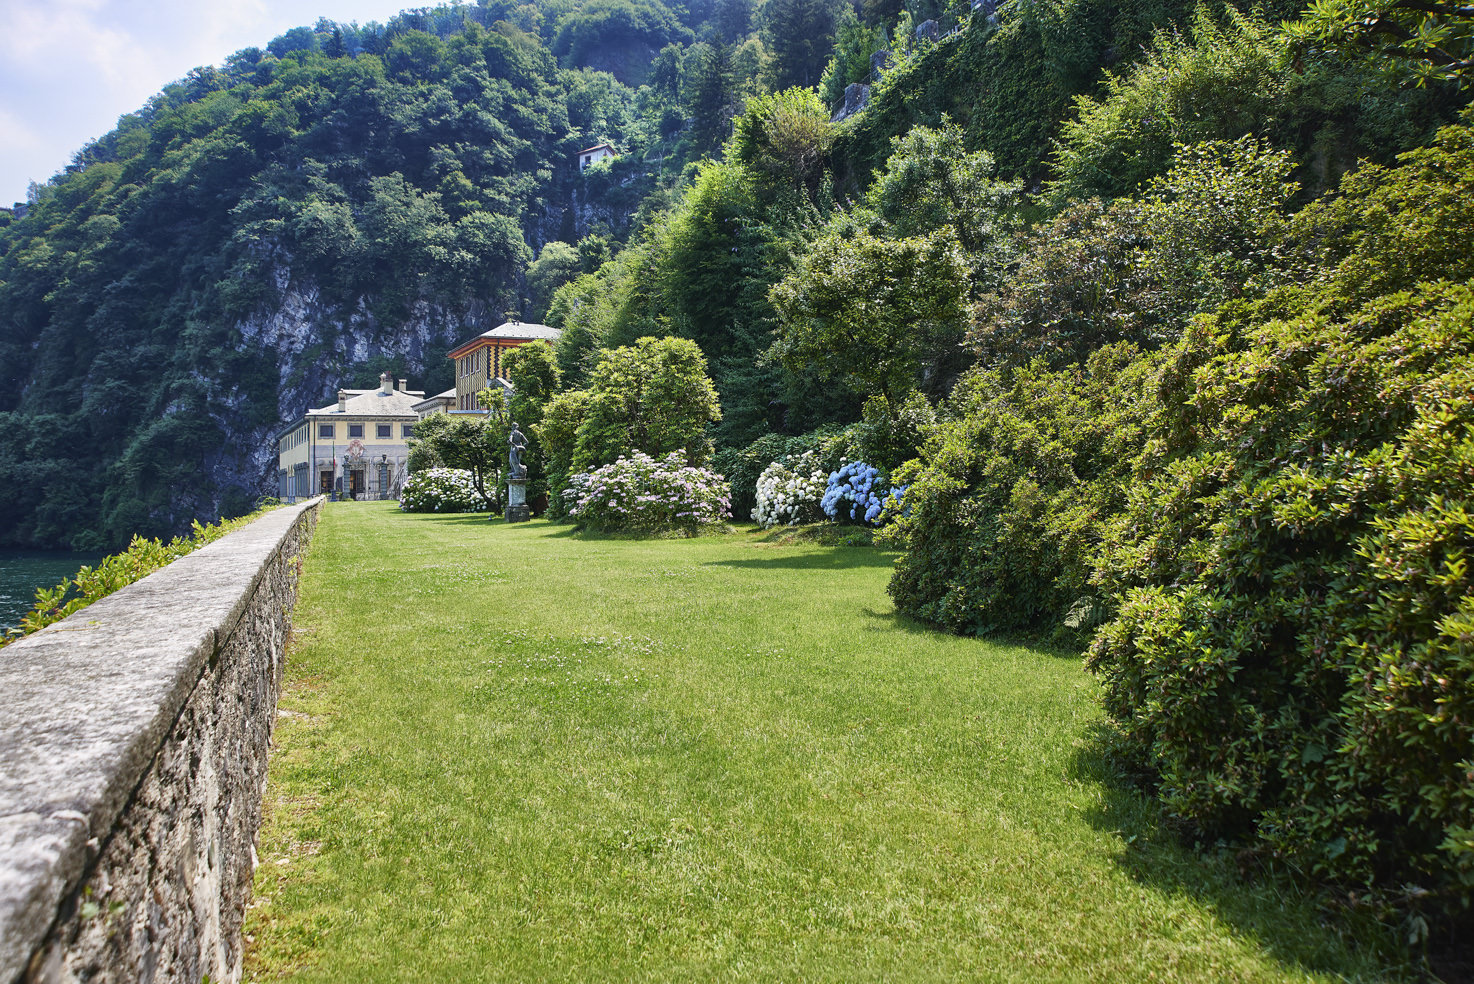 Gardens of Villa Pliniana